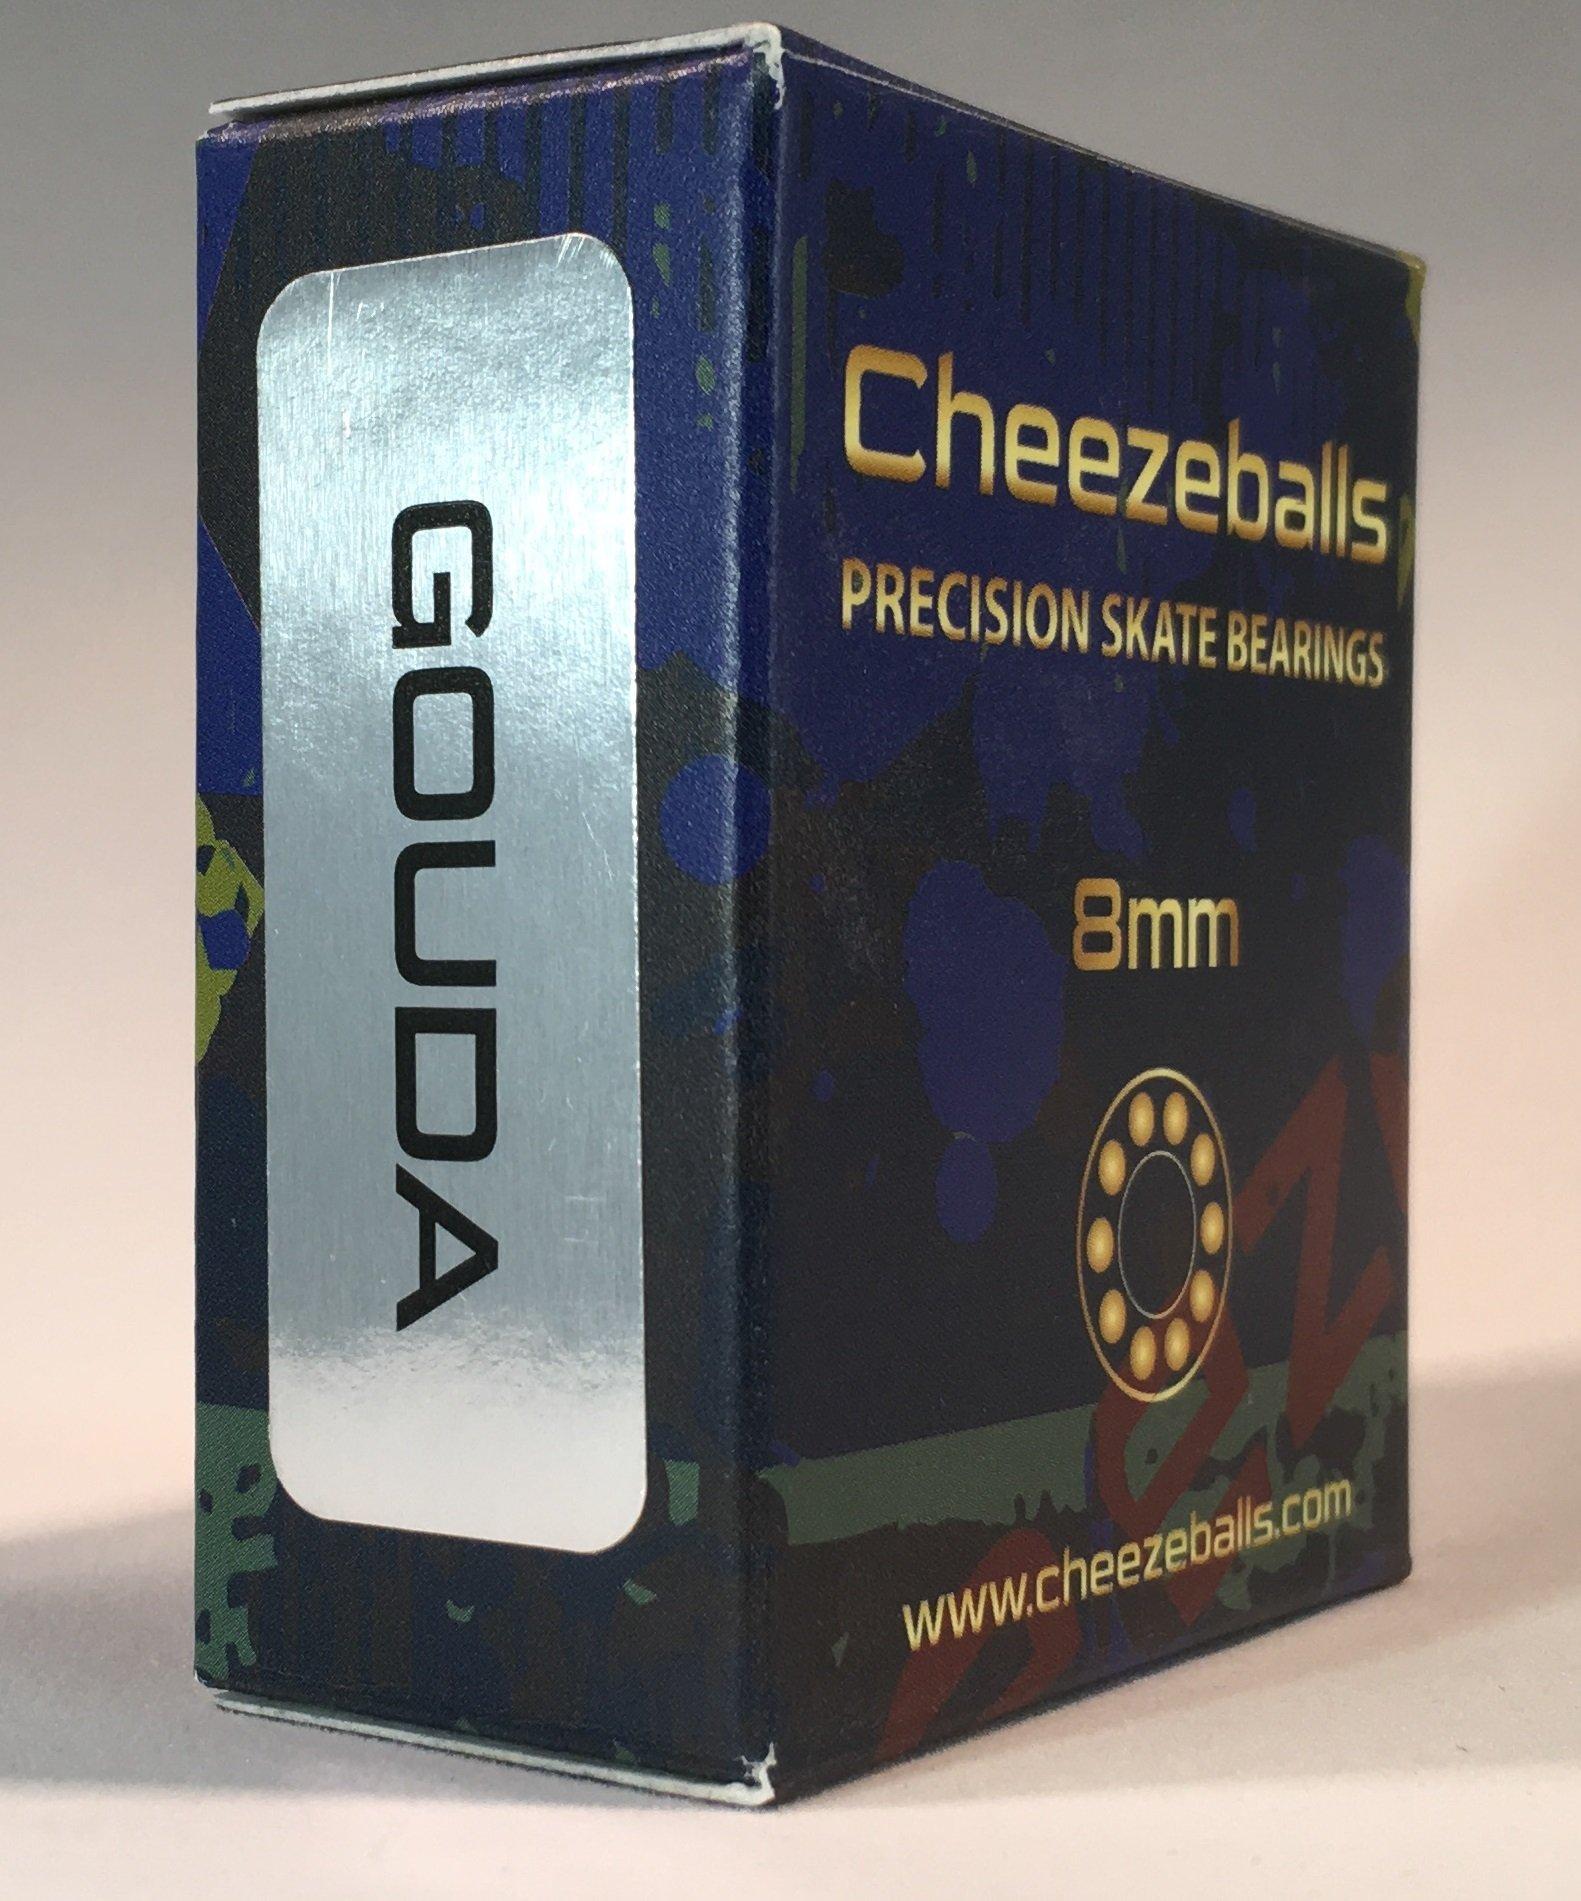 Cheezeballs Gouda Skate Bearings 8mm by Cheezeballs